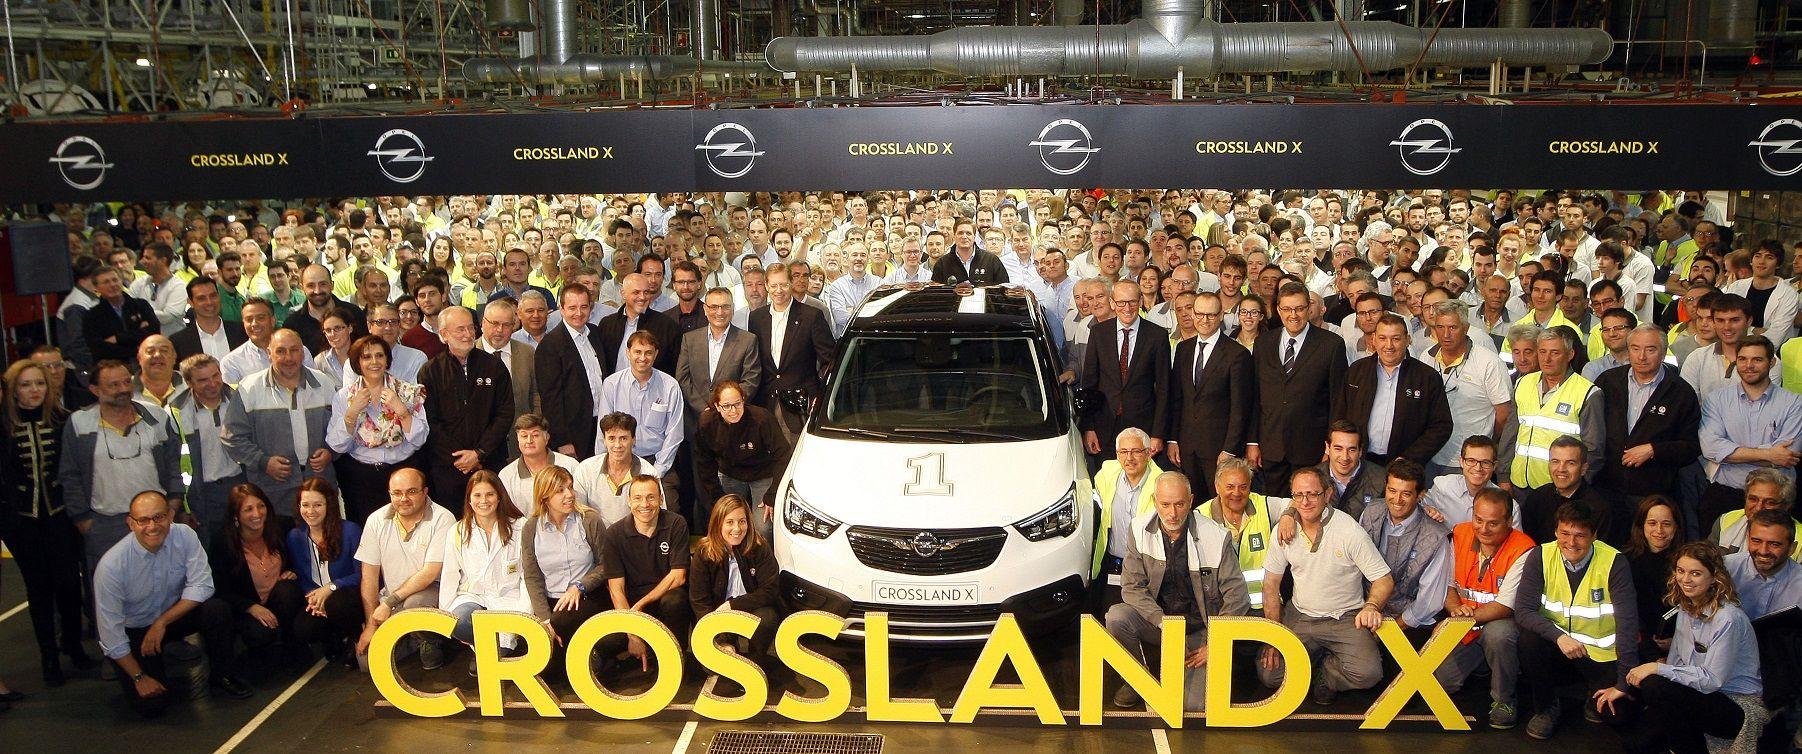 Opel Crossland X from Zaragoza